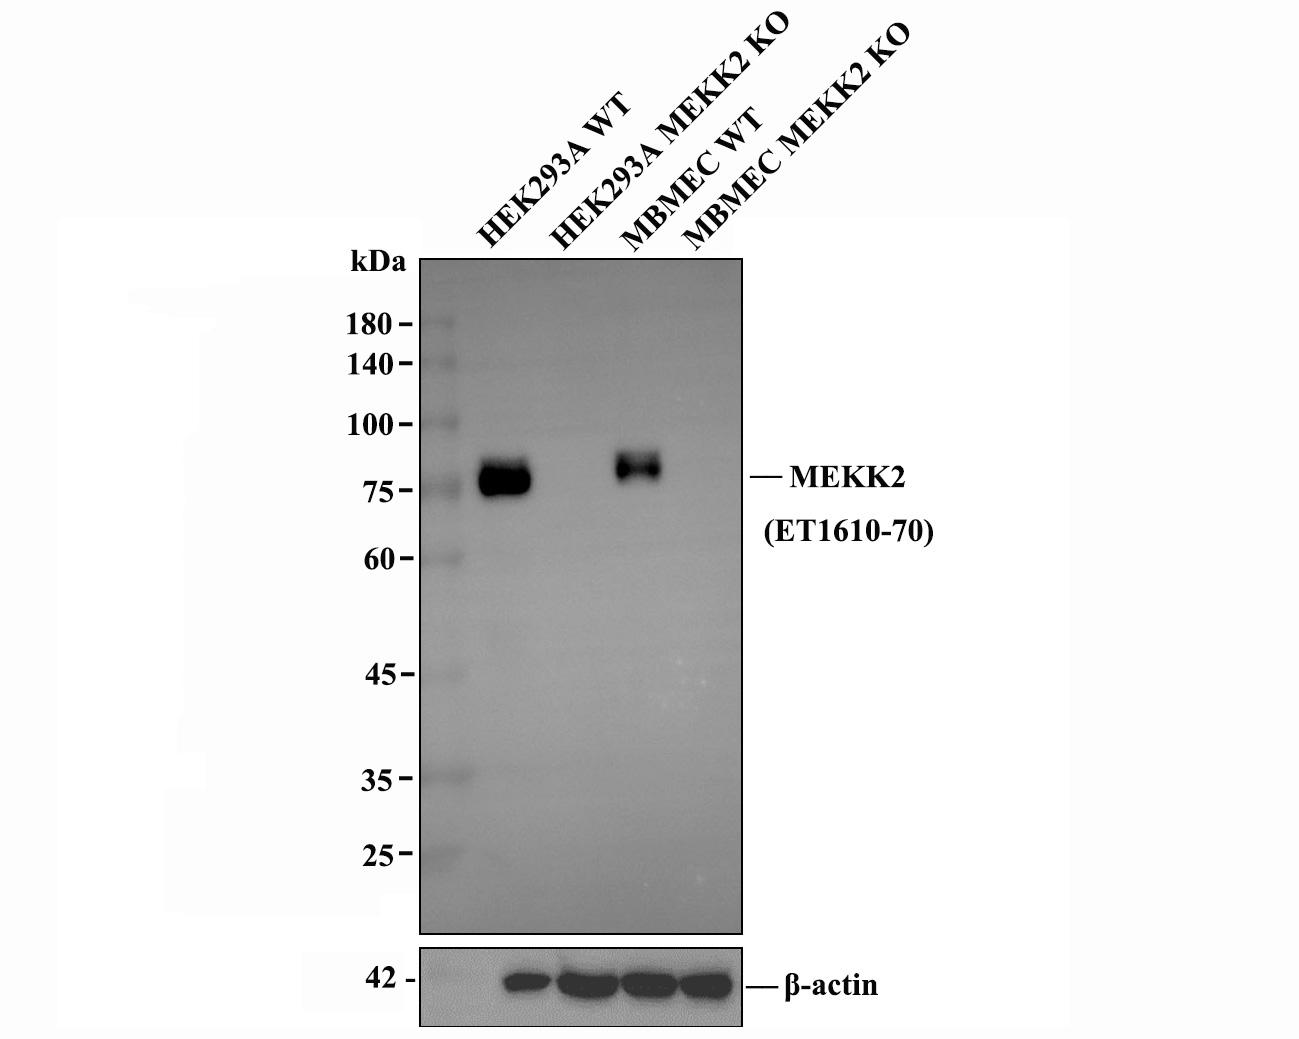 Western blot analysis of MEKK2 on different lysates using anti-MEKK2 antibody at 1/1,000 dilution.<br /> Positive control:   <br /> Lane 1: HepG2            <br /> Lane 2: Rat brain <br /> Lane 3: SW480